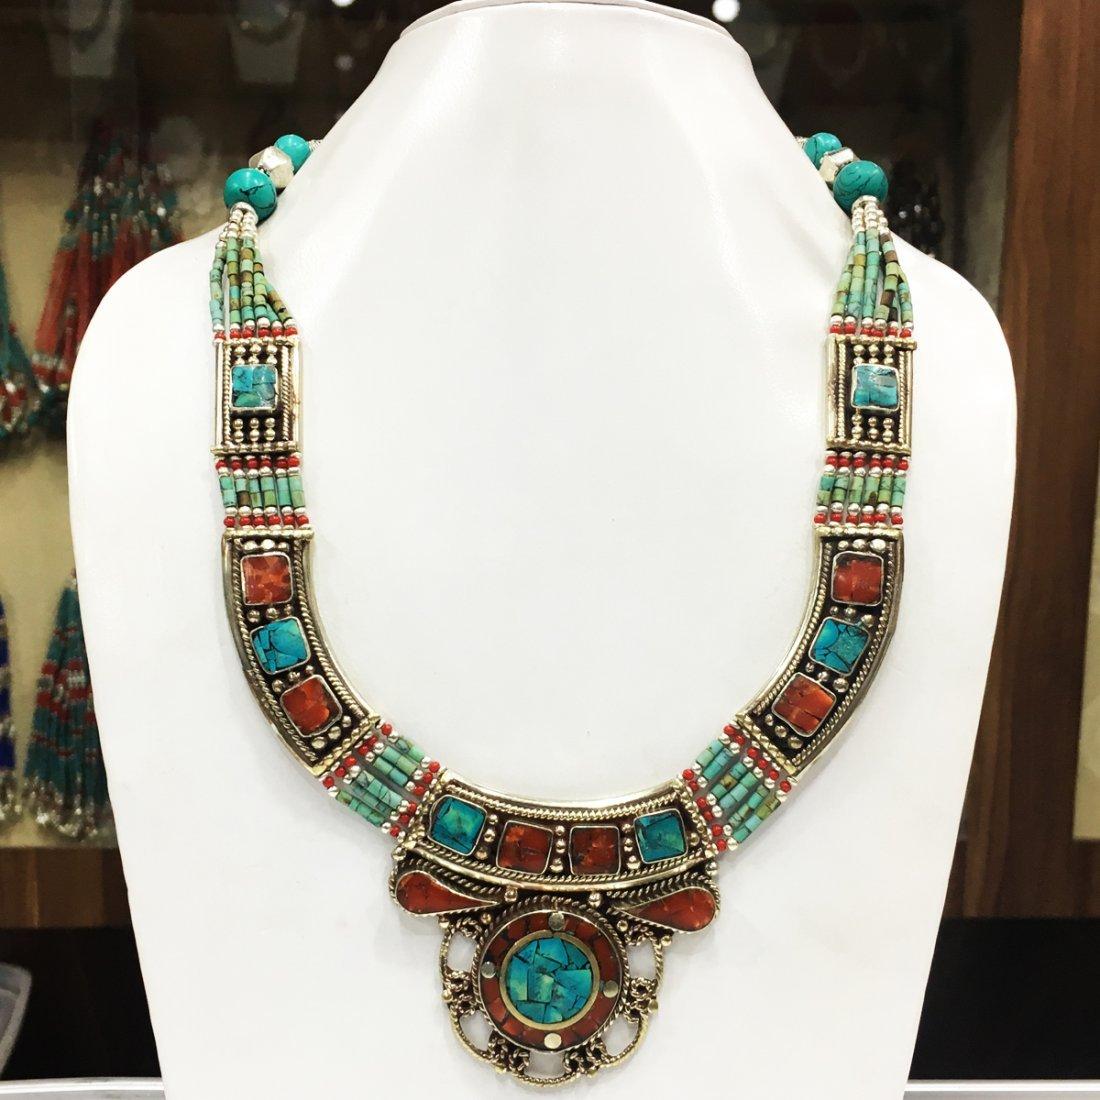 Tibetan Handmade Nepali Ethnic Necklace